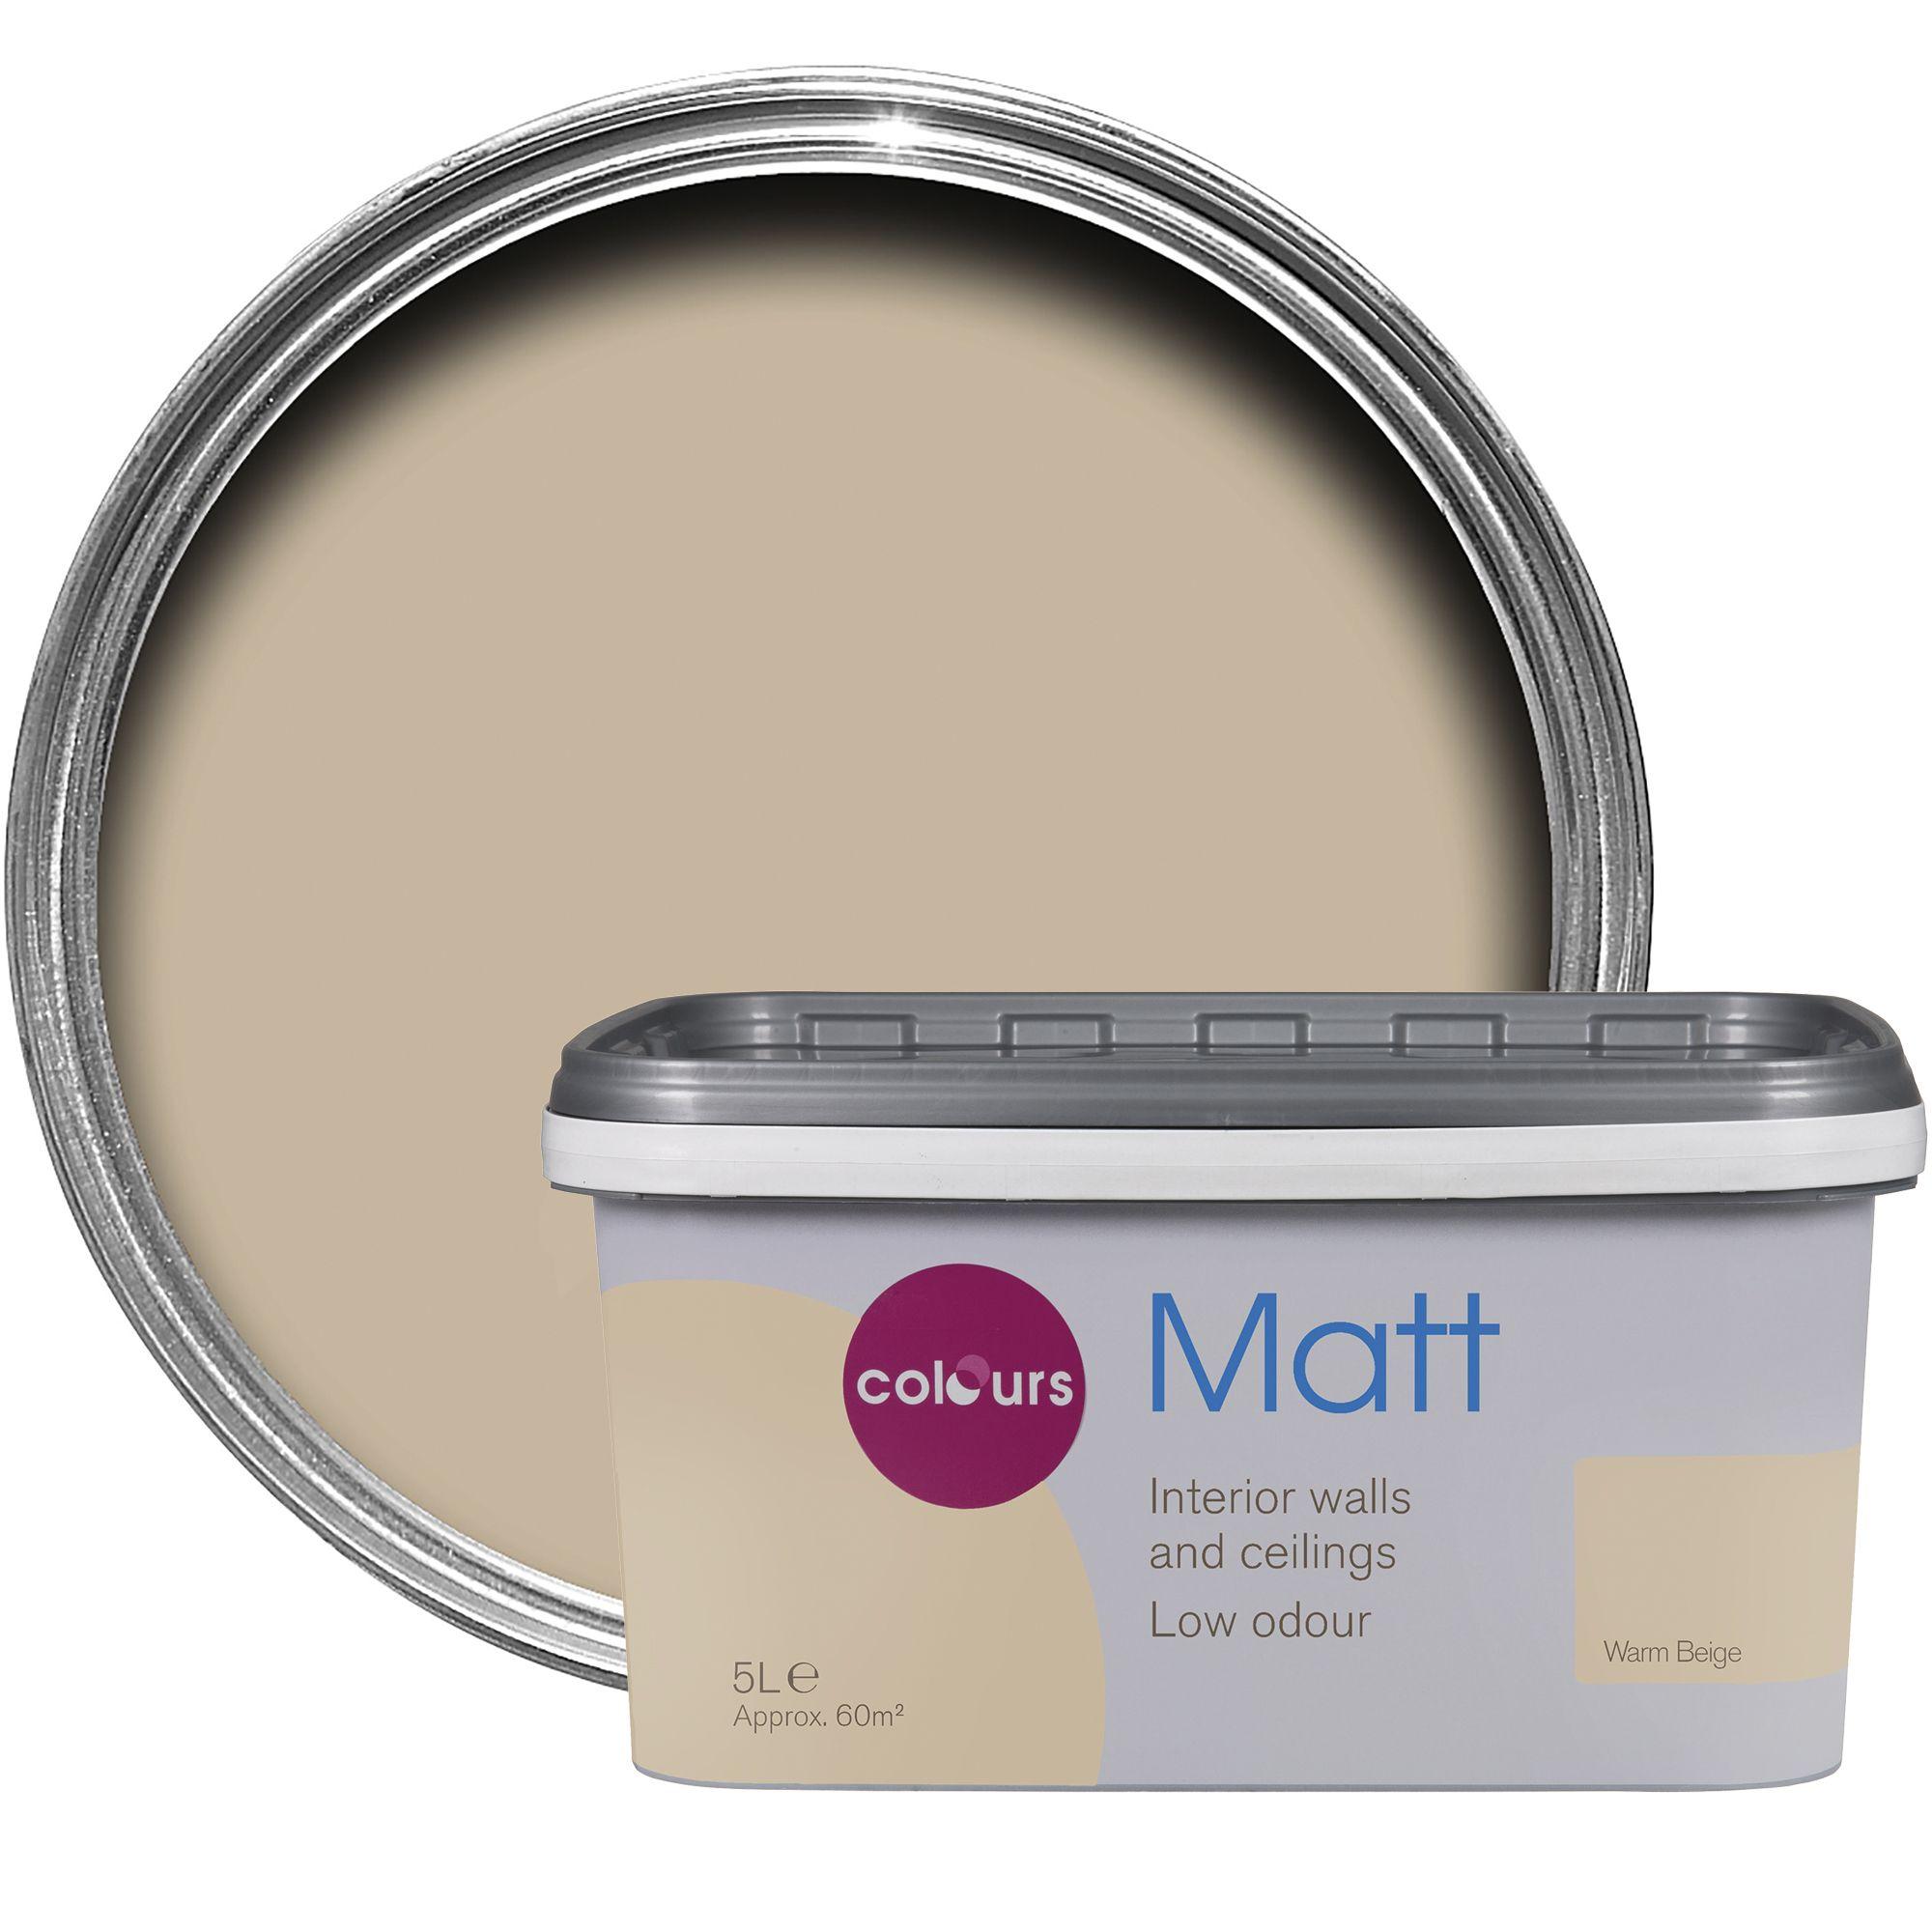 Colours warm beige matt emulsion paint 5l departments for Klebefolie beige matt